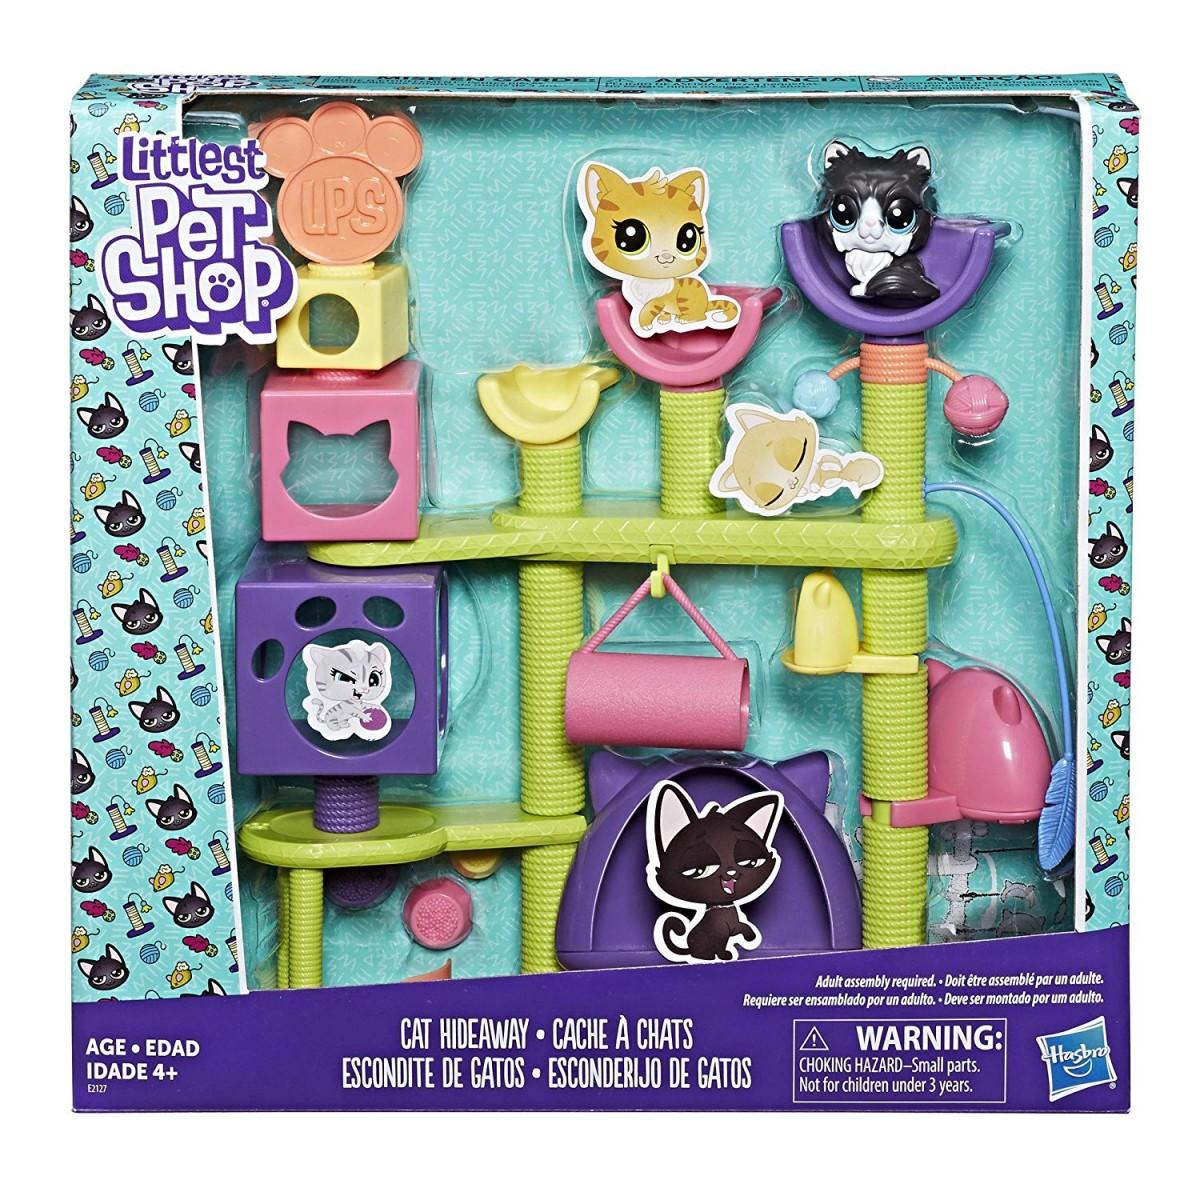 Hasbro Littlest Pet Shop Koci Plac Zabaw E2127 E2127 Gugu Zabawki